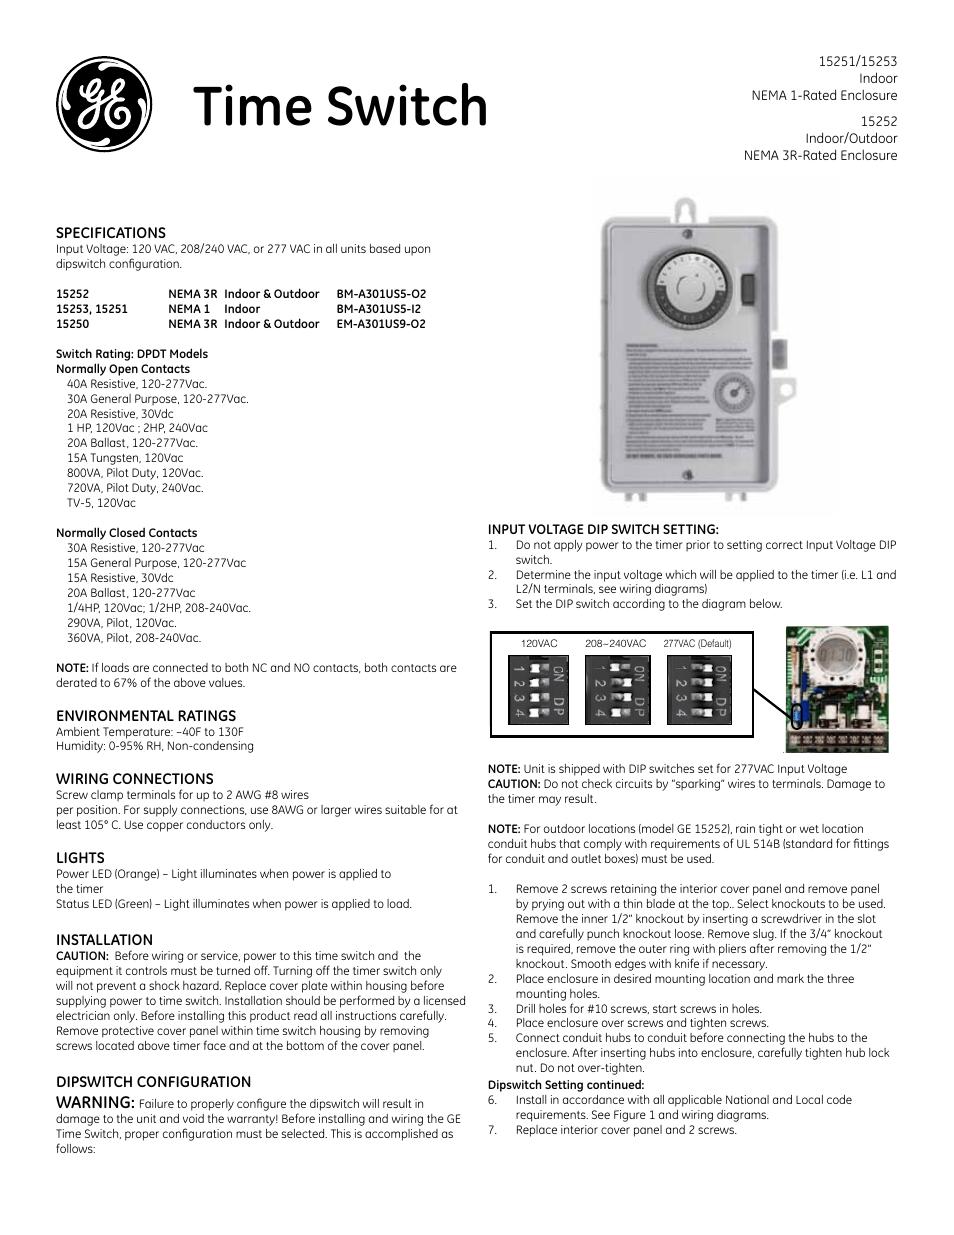 supco rco810 wiring diagram motor diagrams wiring diagram